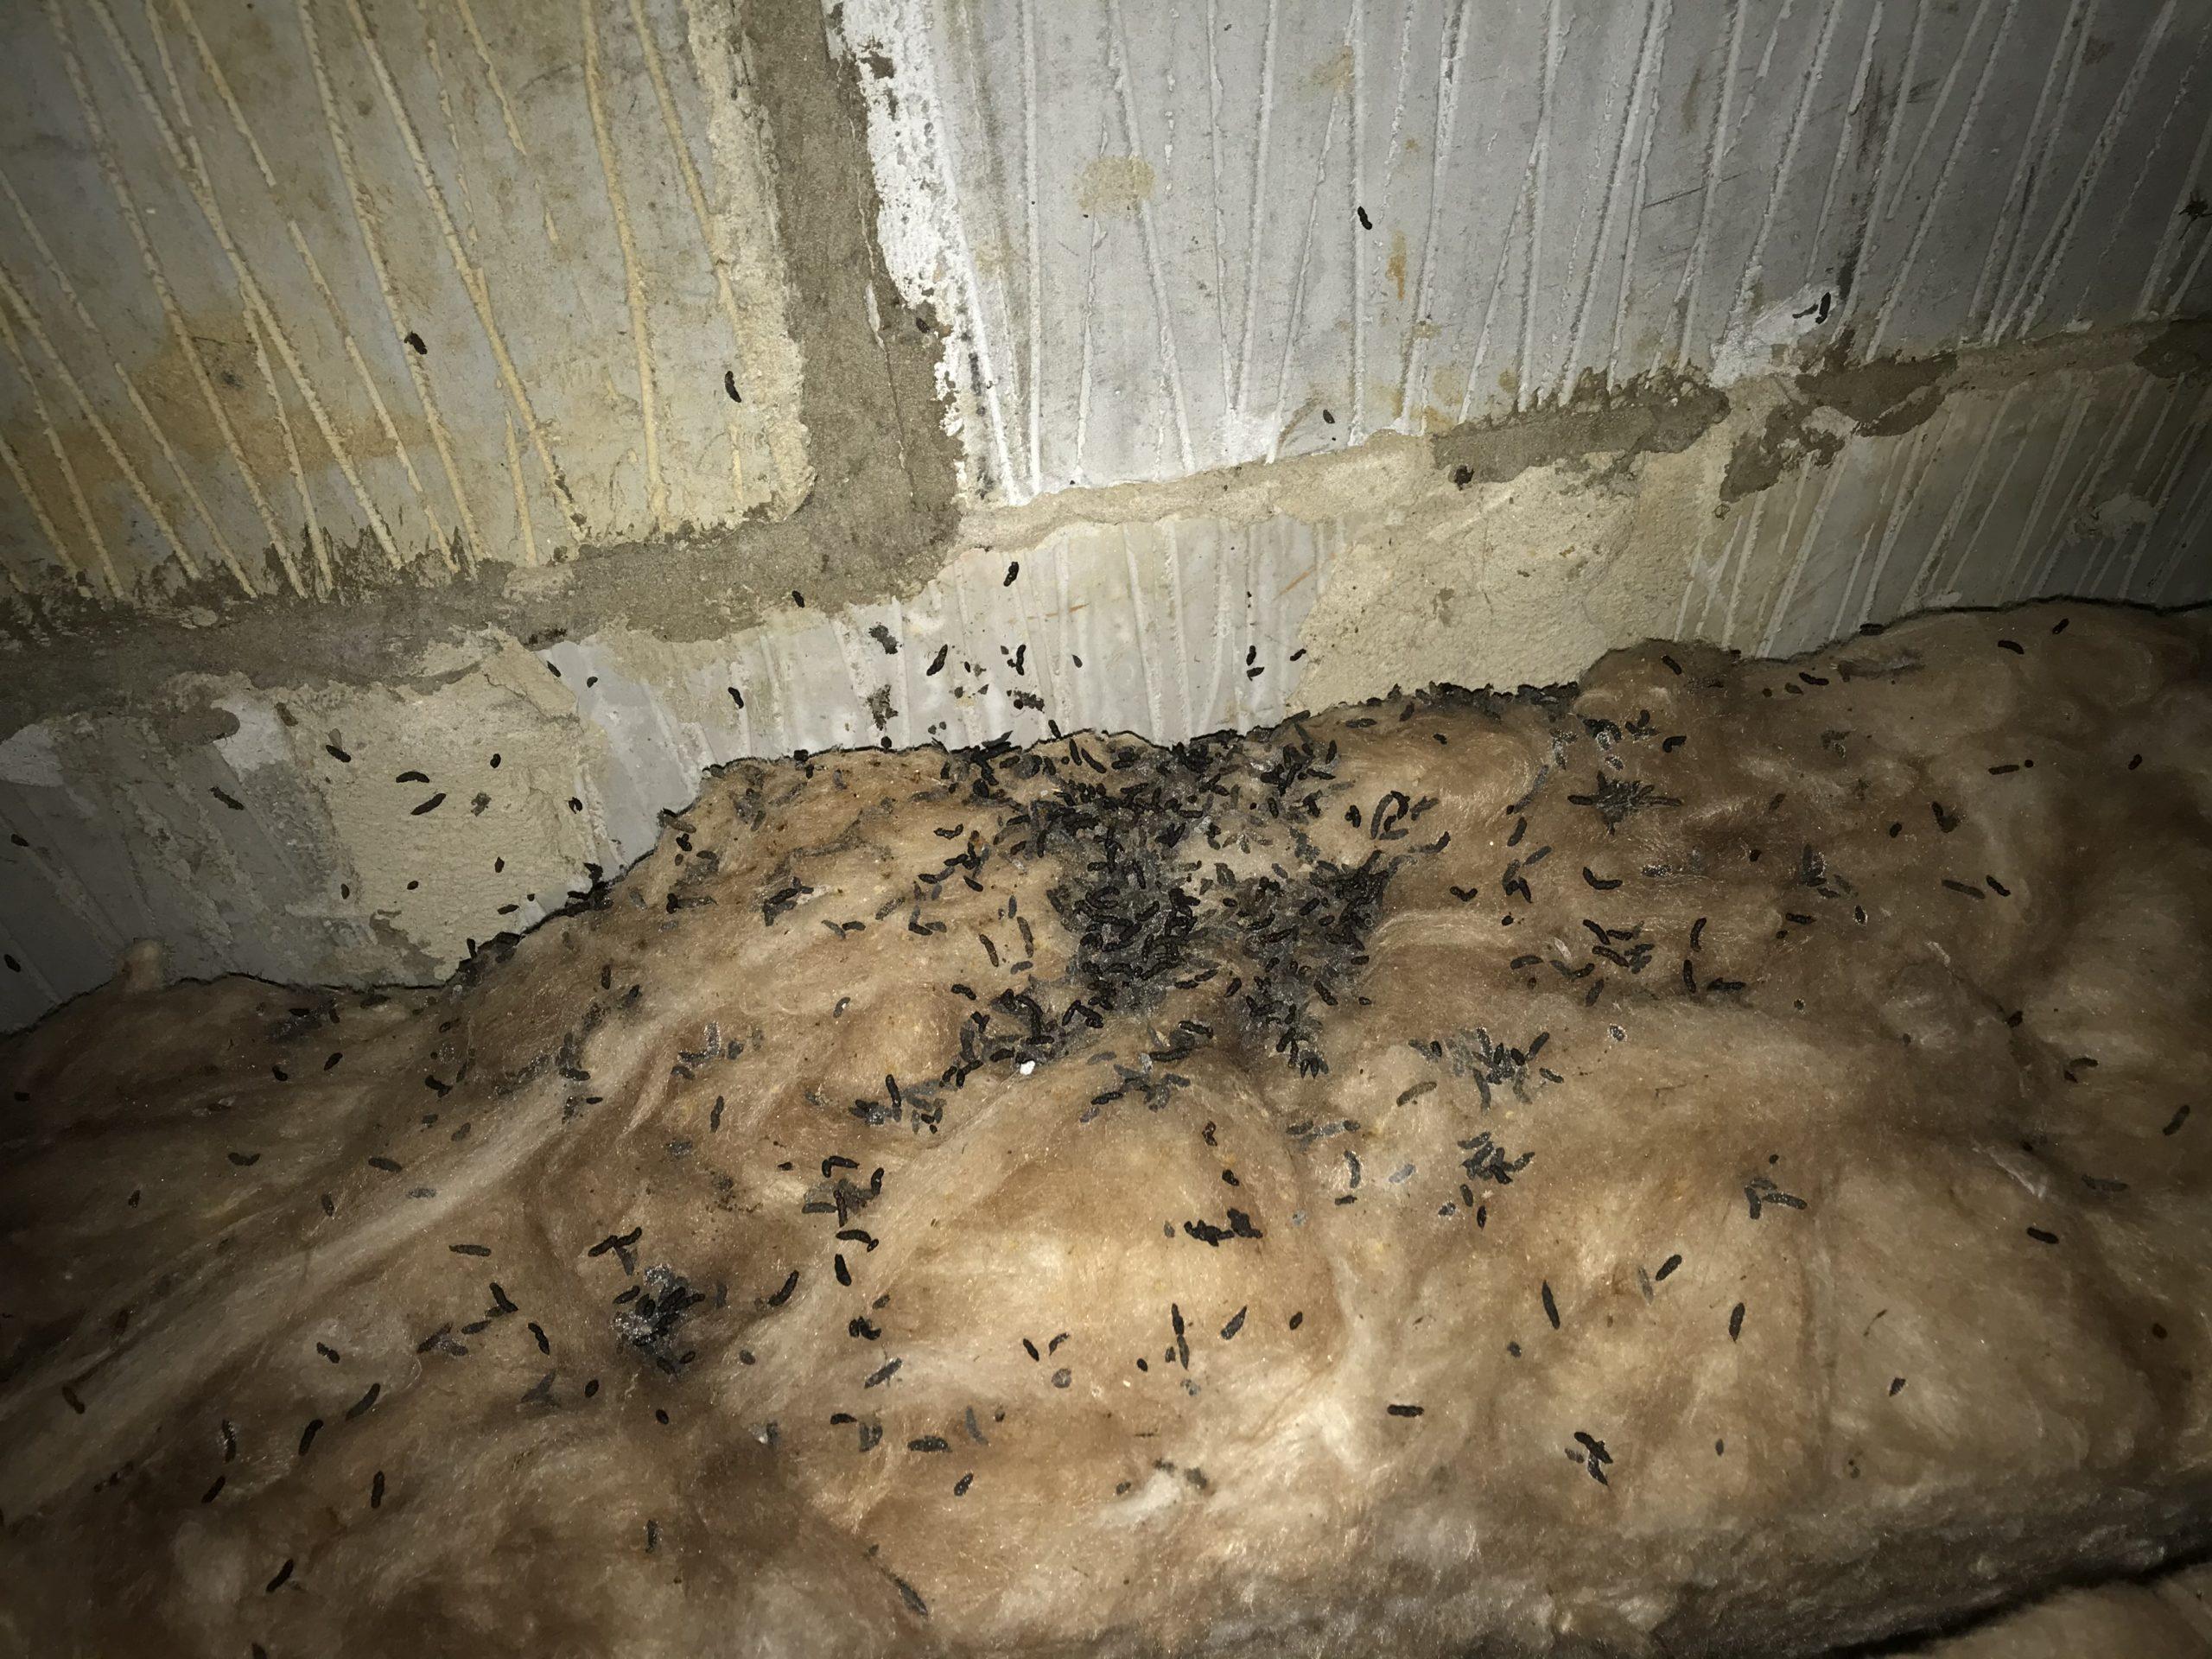 Bats and Pest Control